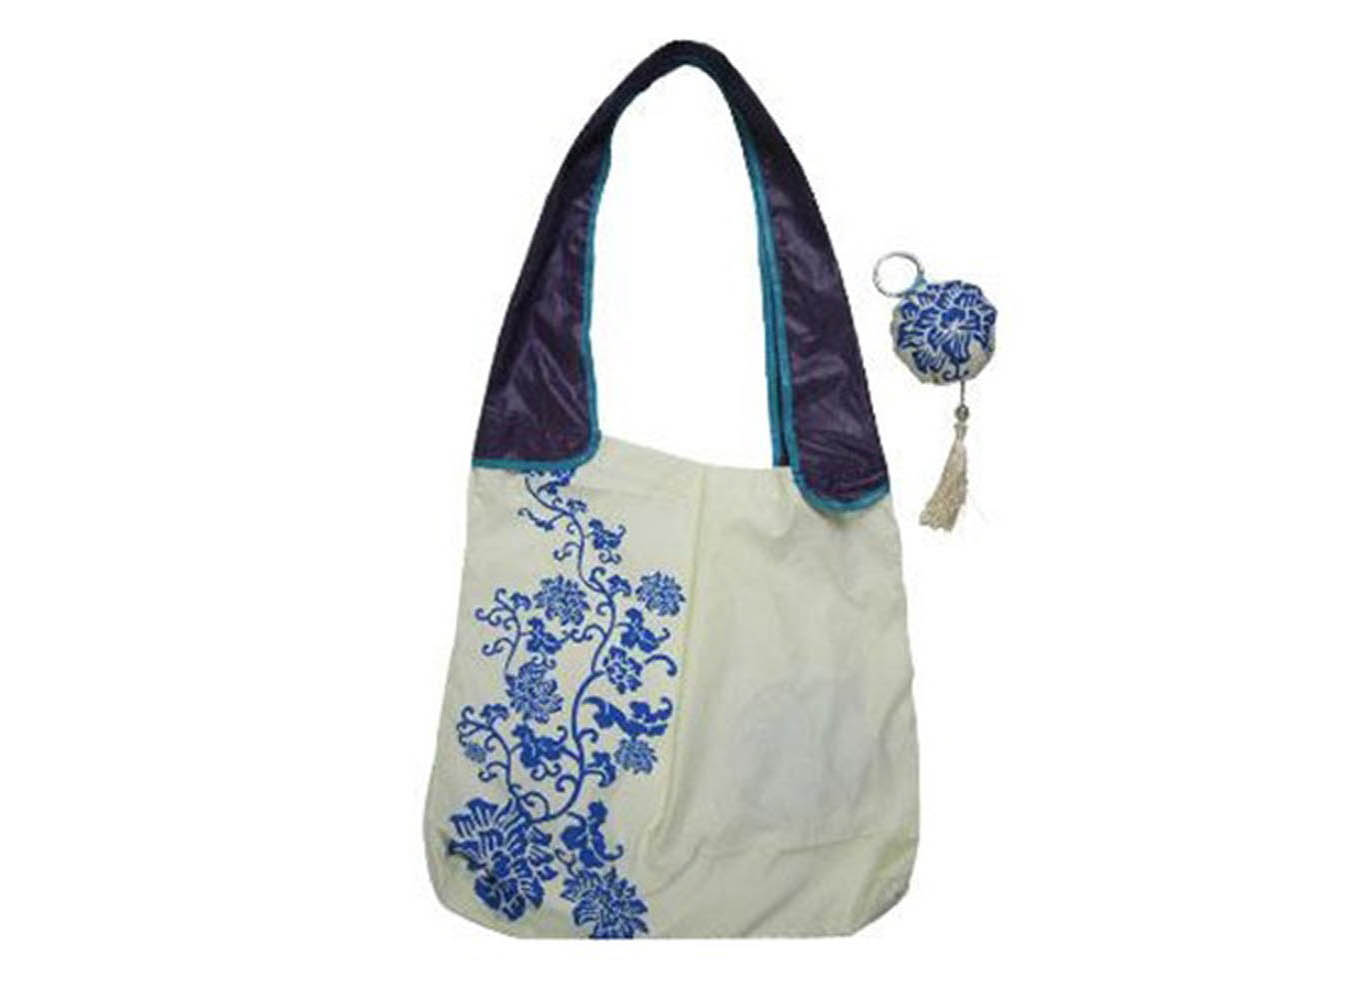 Custom Printed Shoulder Fold-Up Bag in Pouch w/ Tassel Embellishment